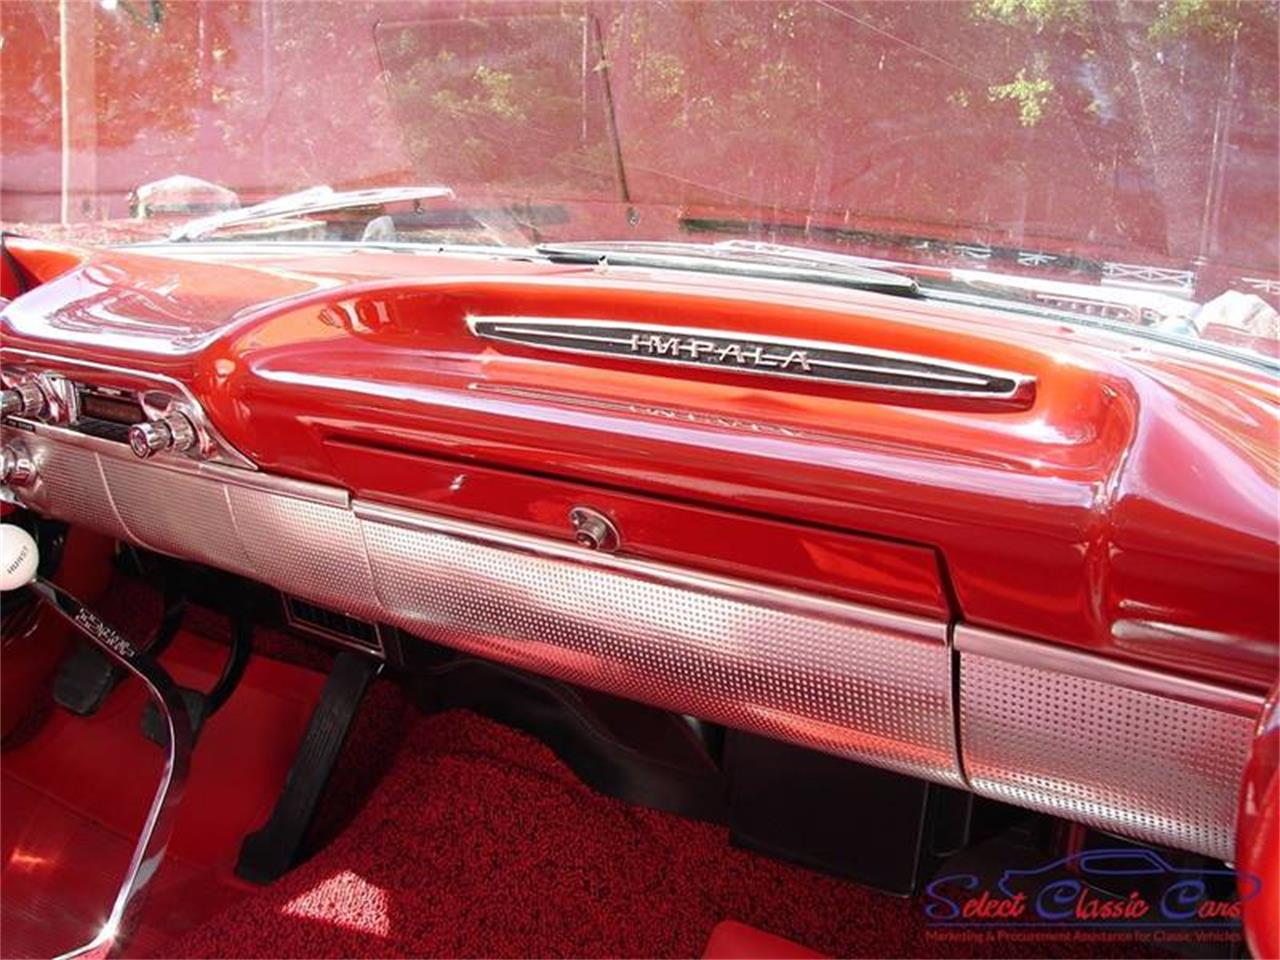 Large Picture of Classic 1960 Impala located in Georgia - $44,500.00 - L613